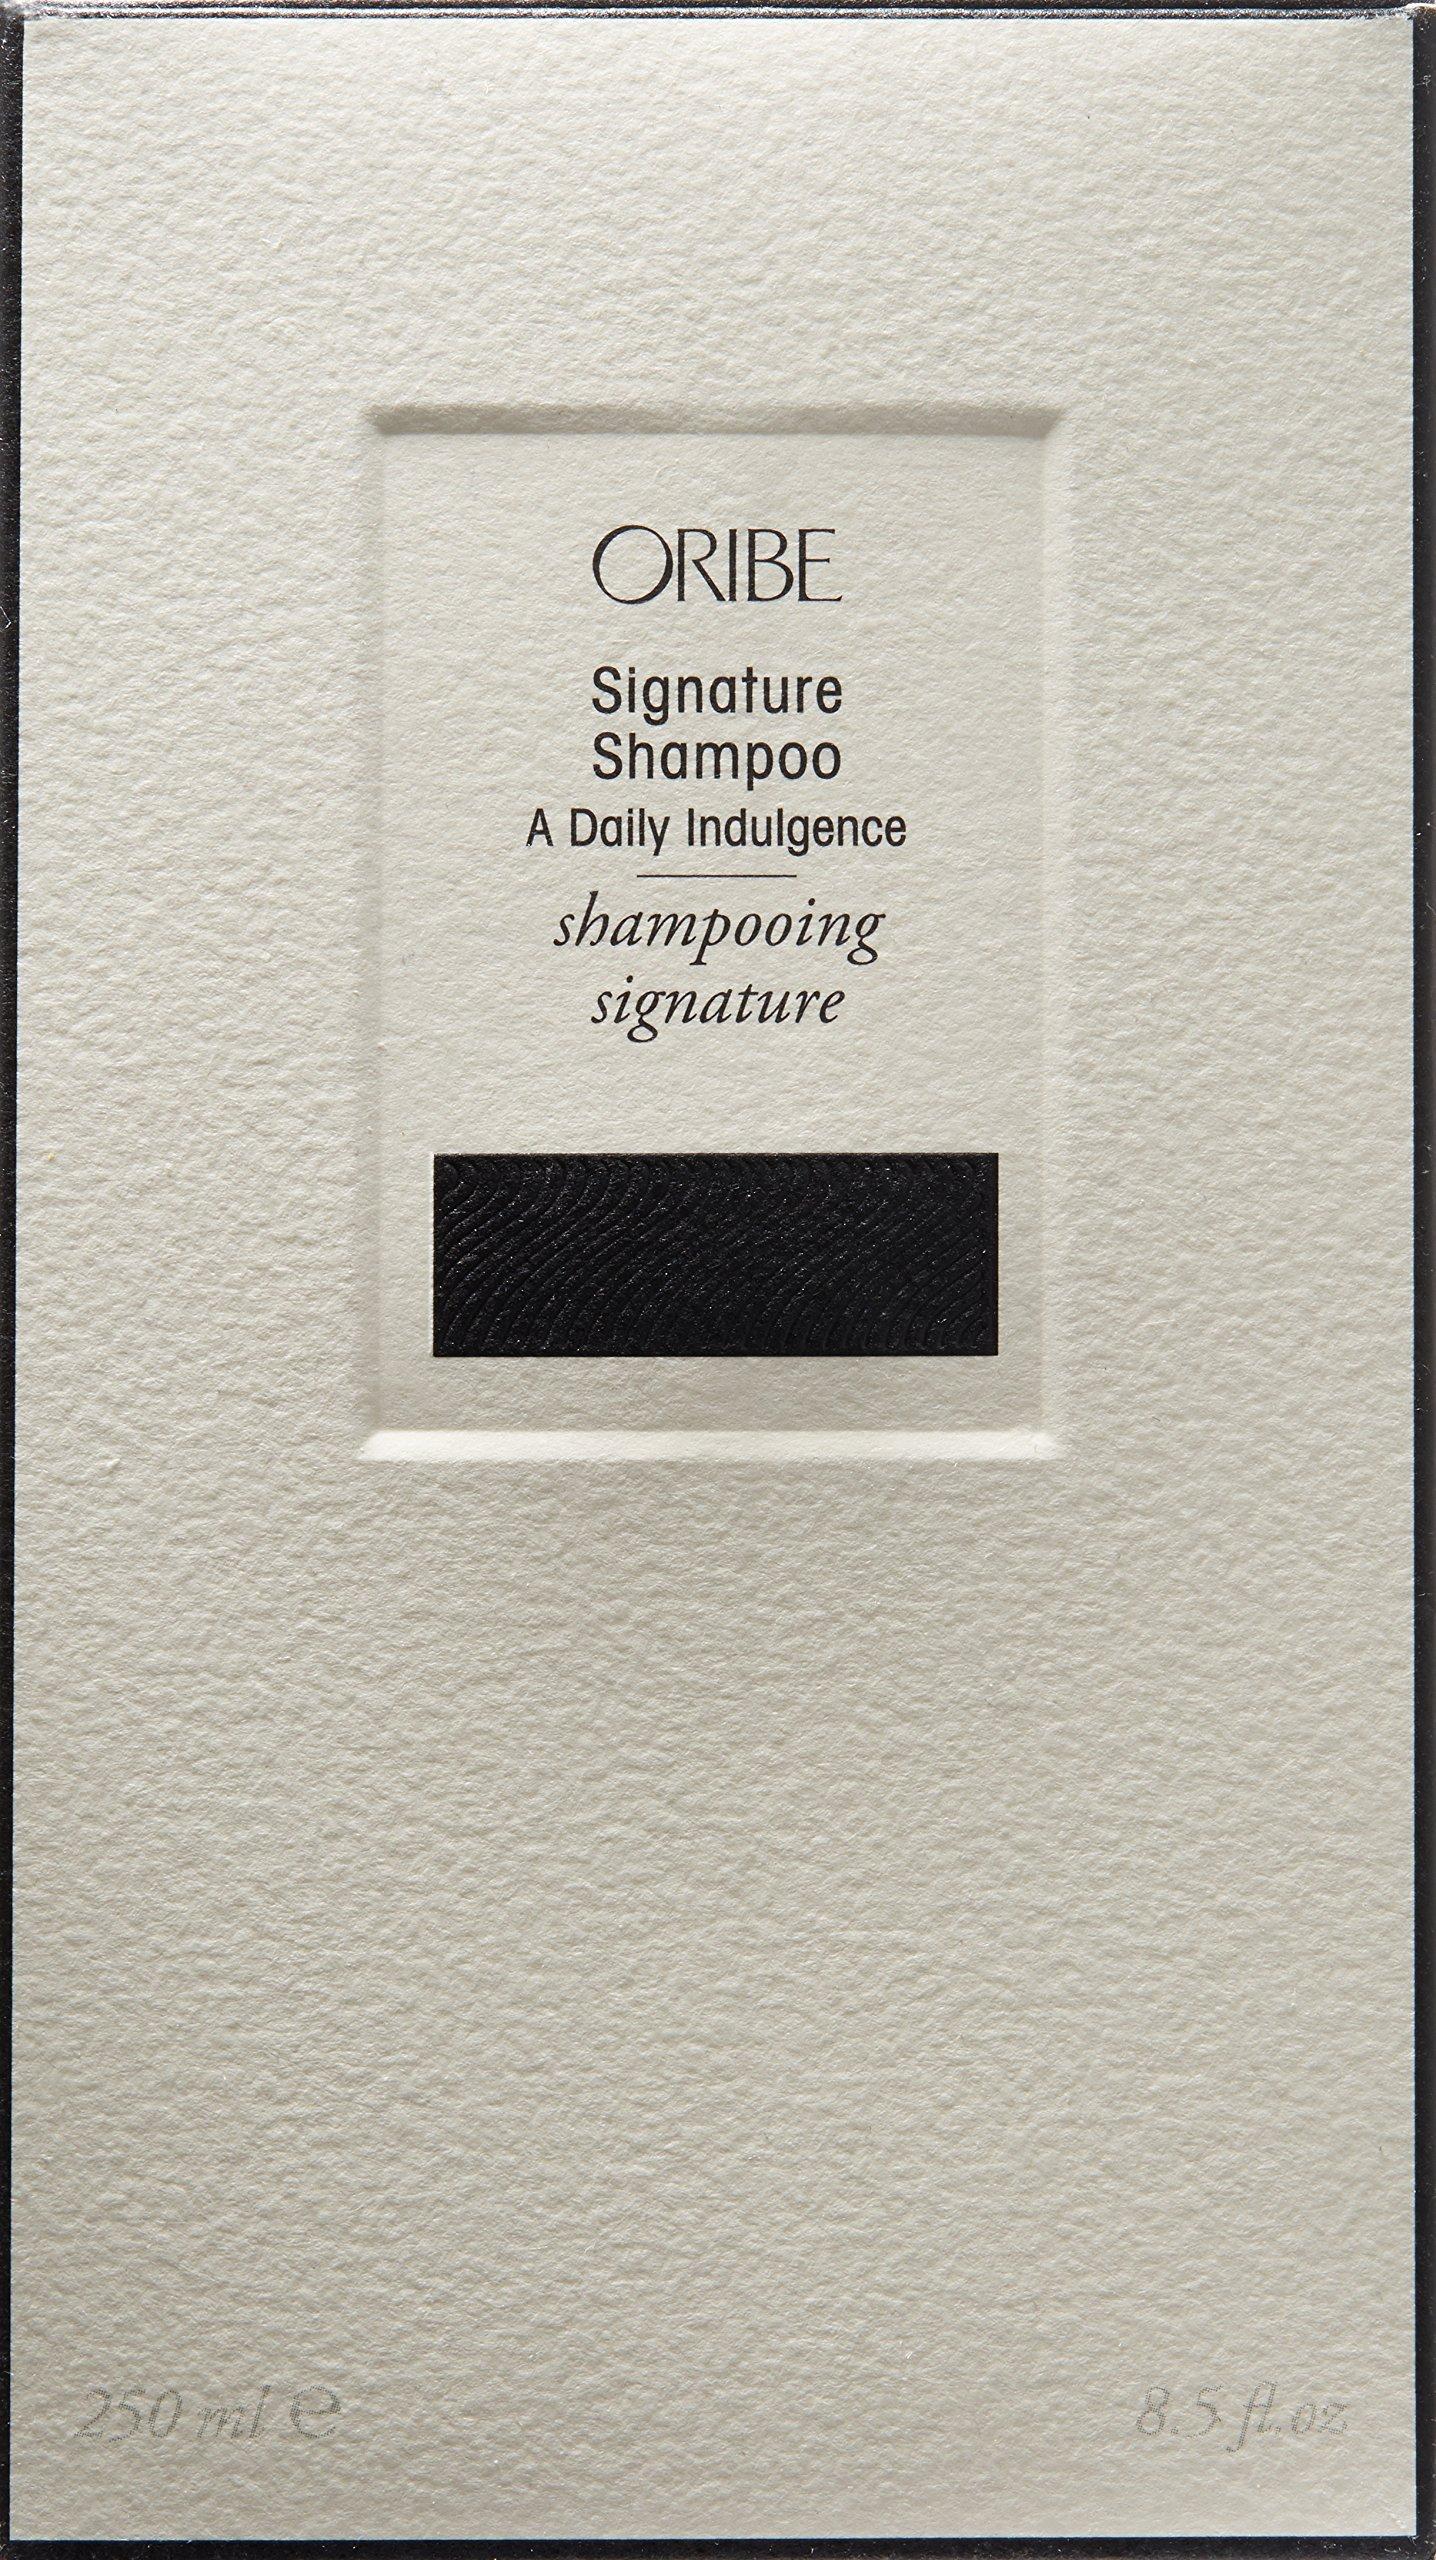 Oribe Hair Shampoo, Signature, 8.5 Fl Oz by ORIBE (Image #4)